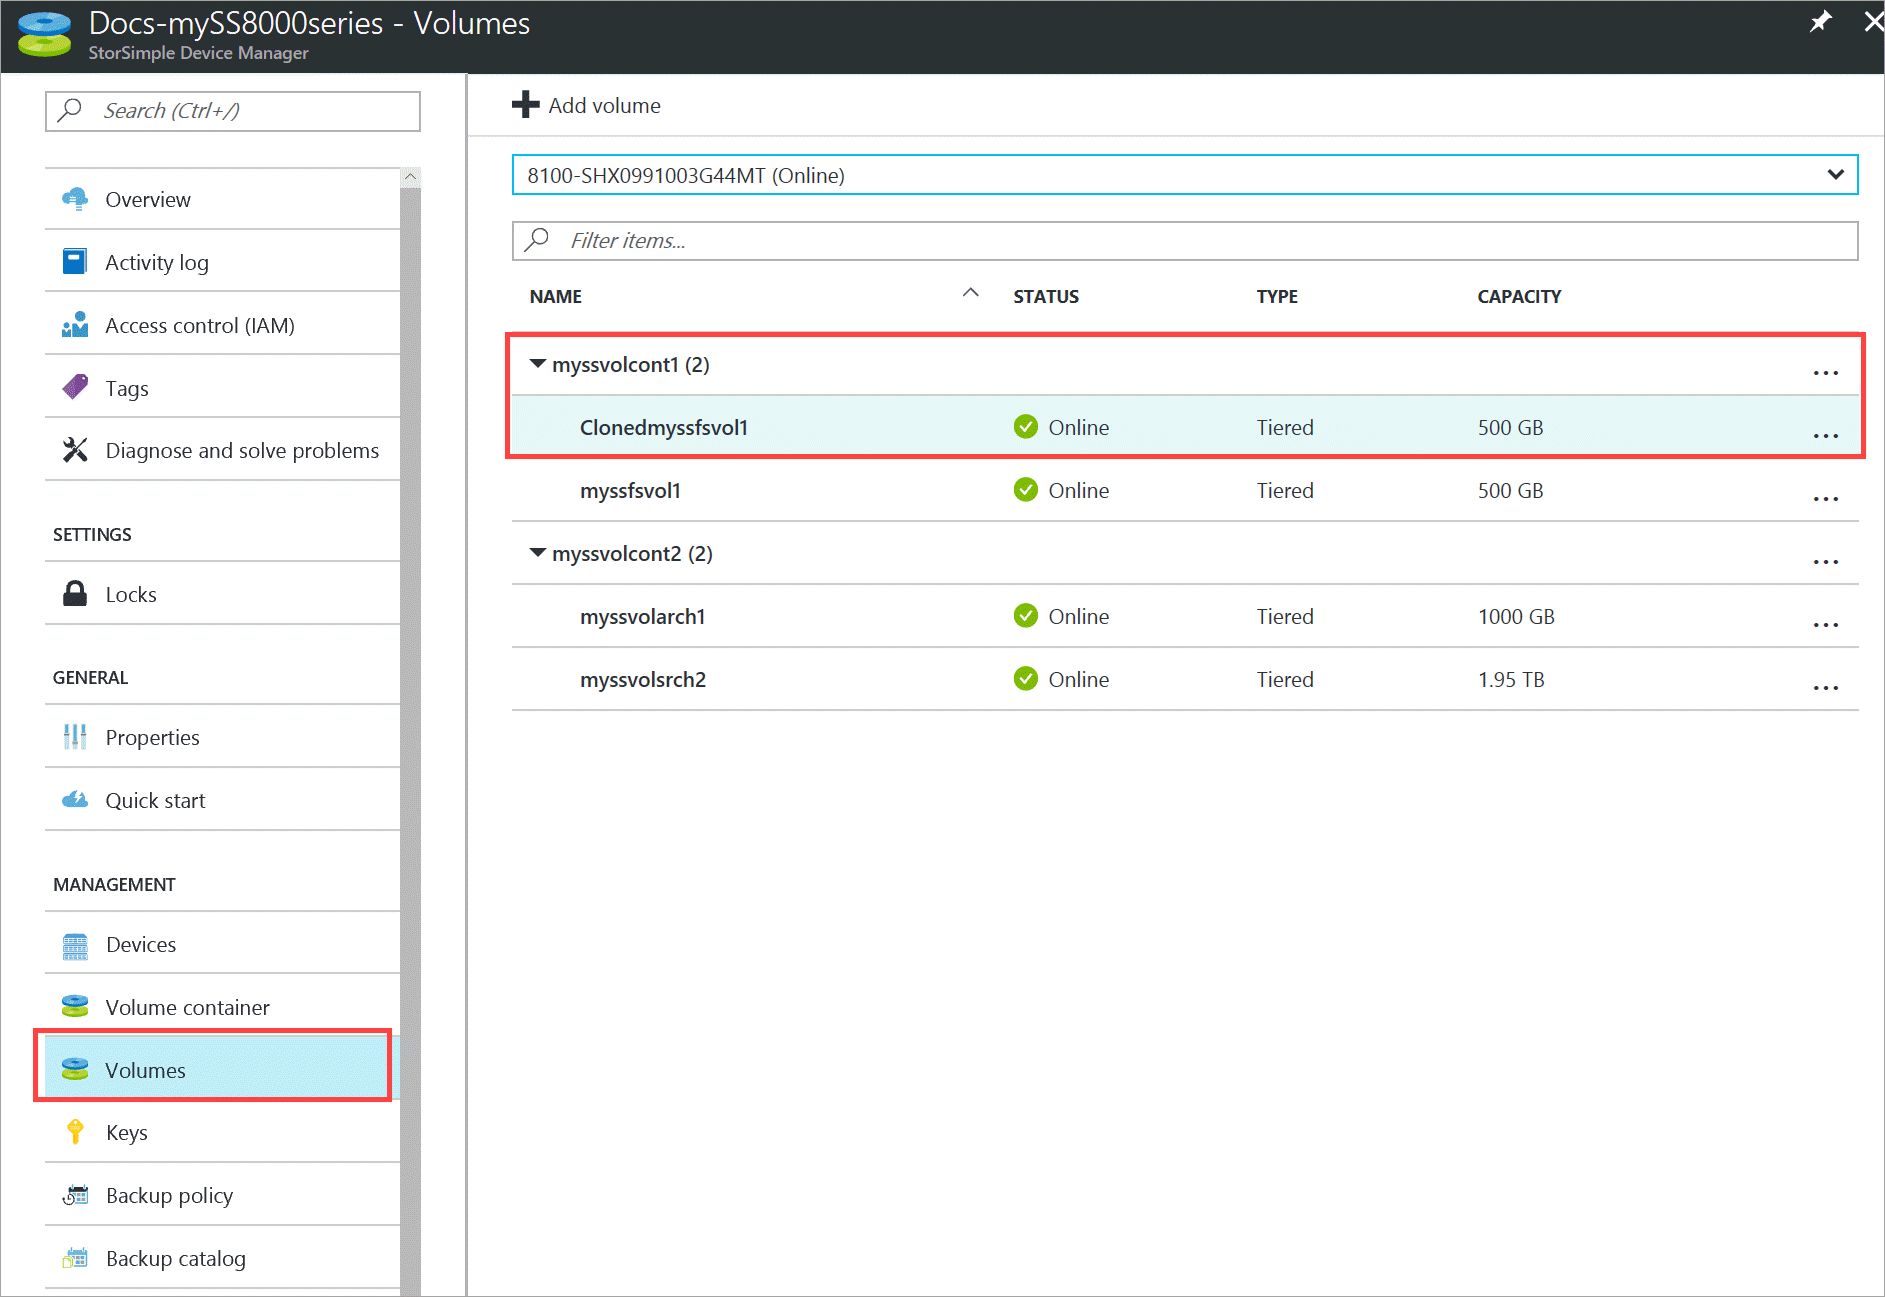 Clone a volume on StorSimple 8000 series | Microsoft Docs